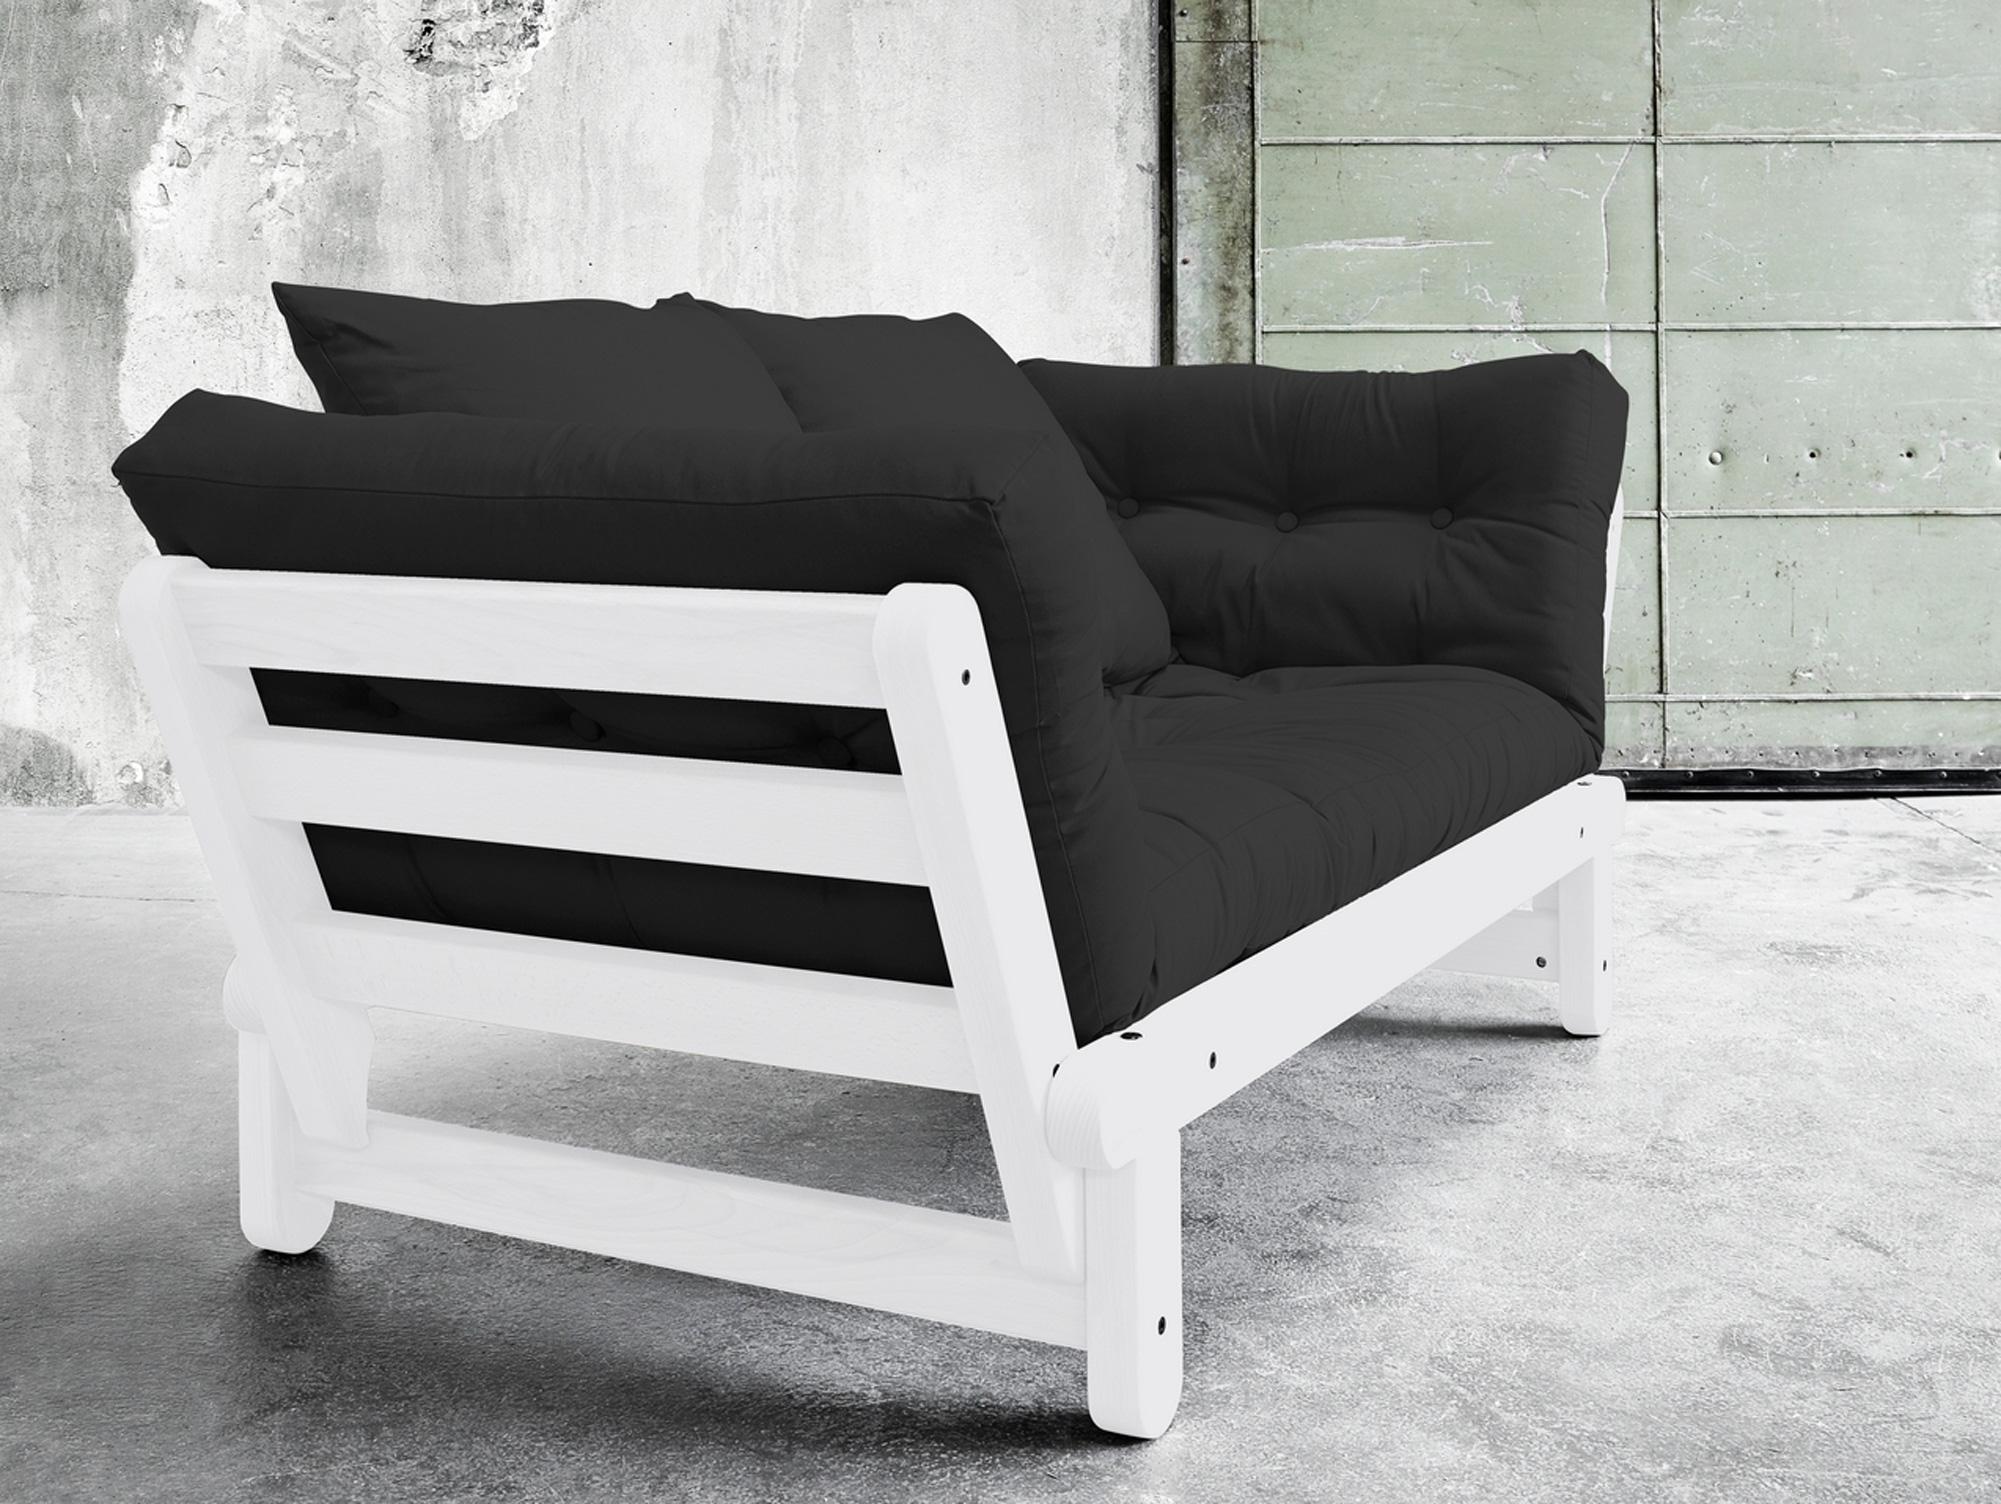 benjo funktionssofa kiefer natur und wei kiefer weiss dunkelgrau. Black Bedroom Furniture Sets. Home Design Ideas